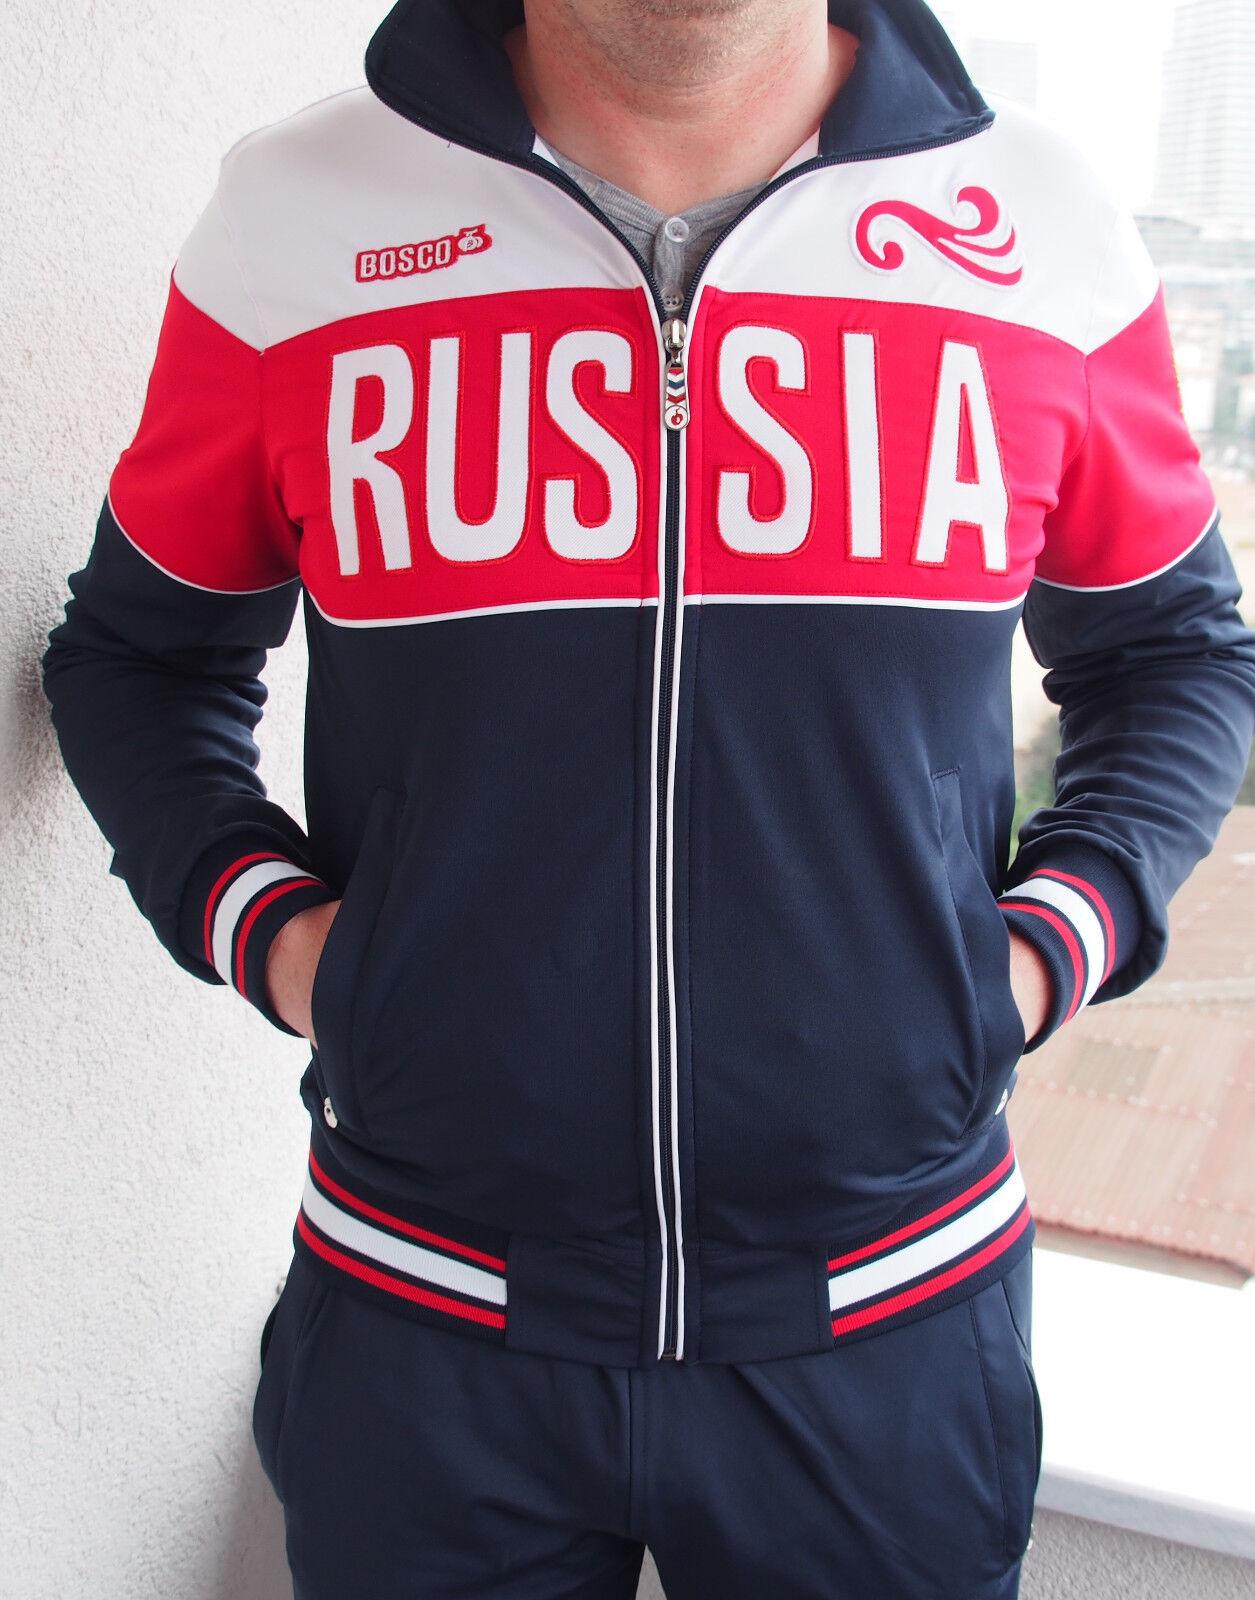 Rio 2016 Brasilien Bosco Sport Russland De Olympische Spiele Kostüm Herren Lycra